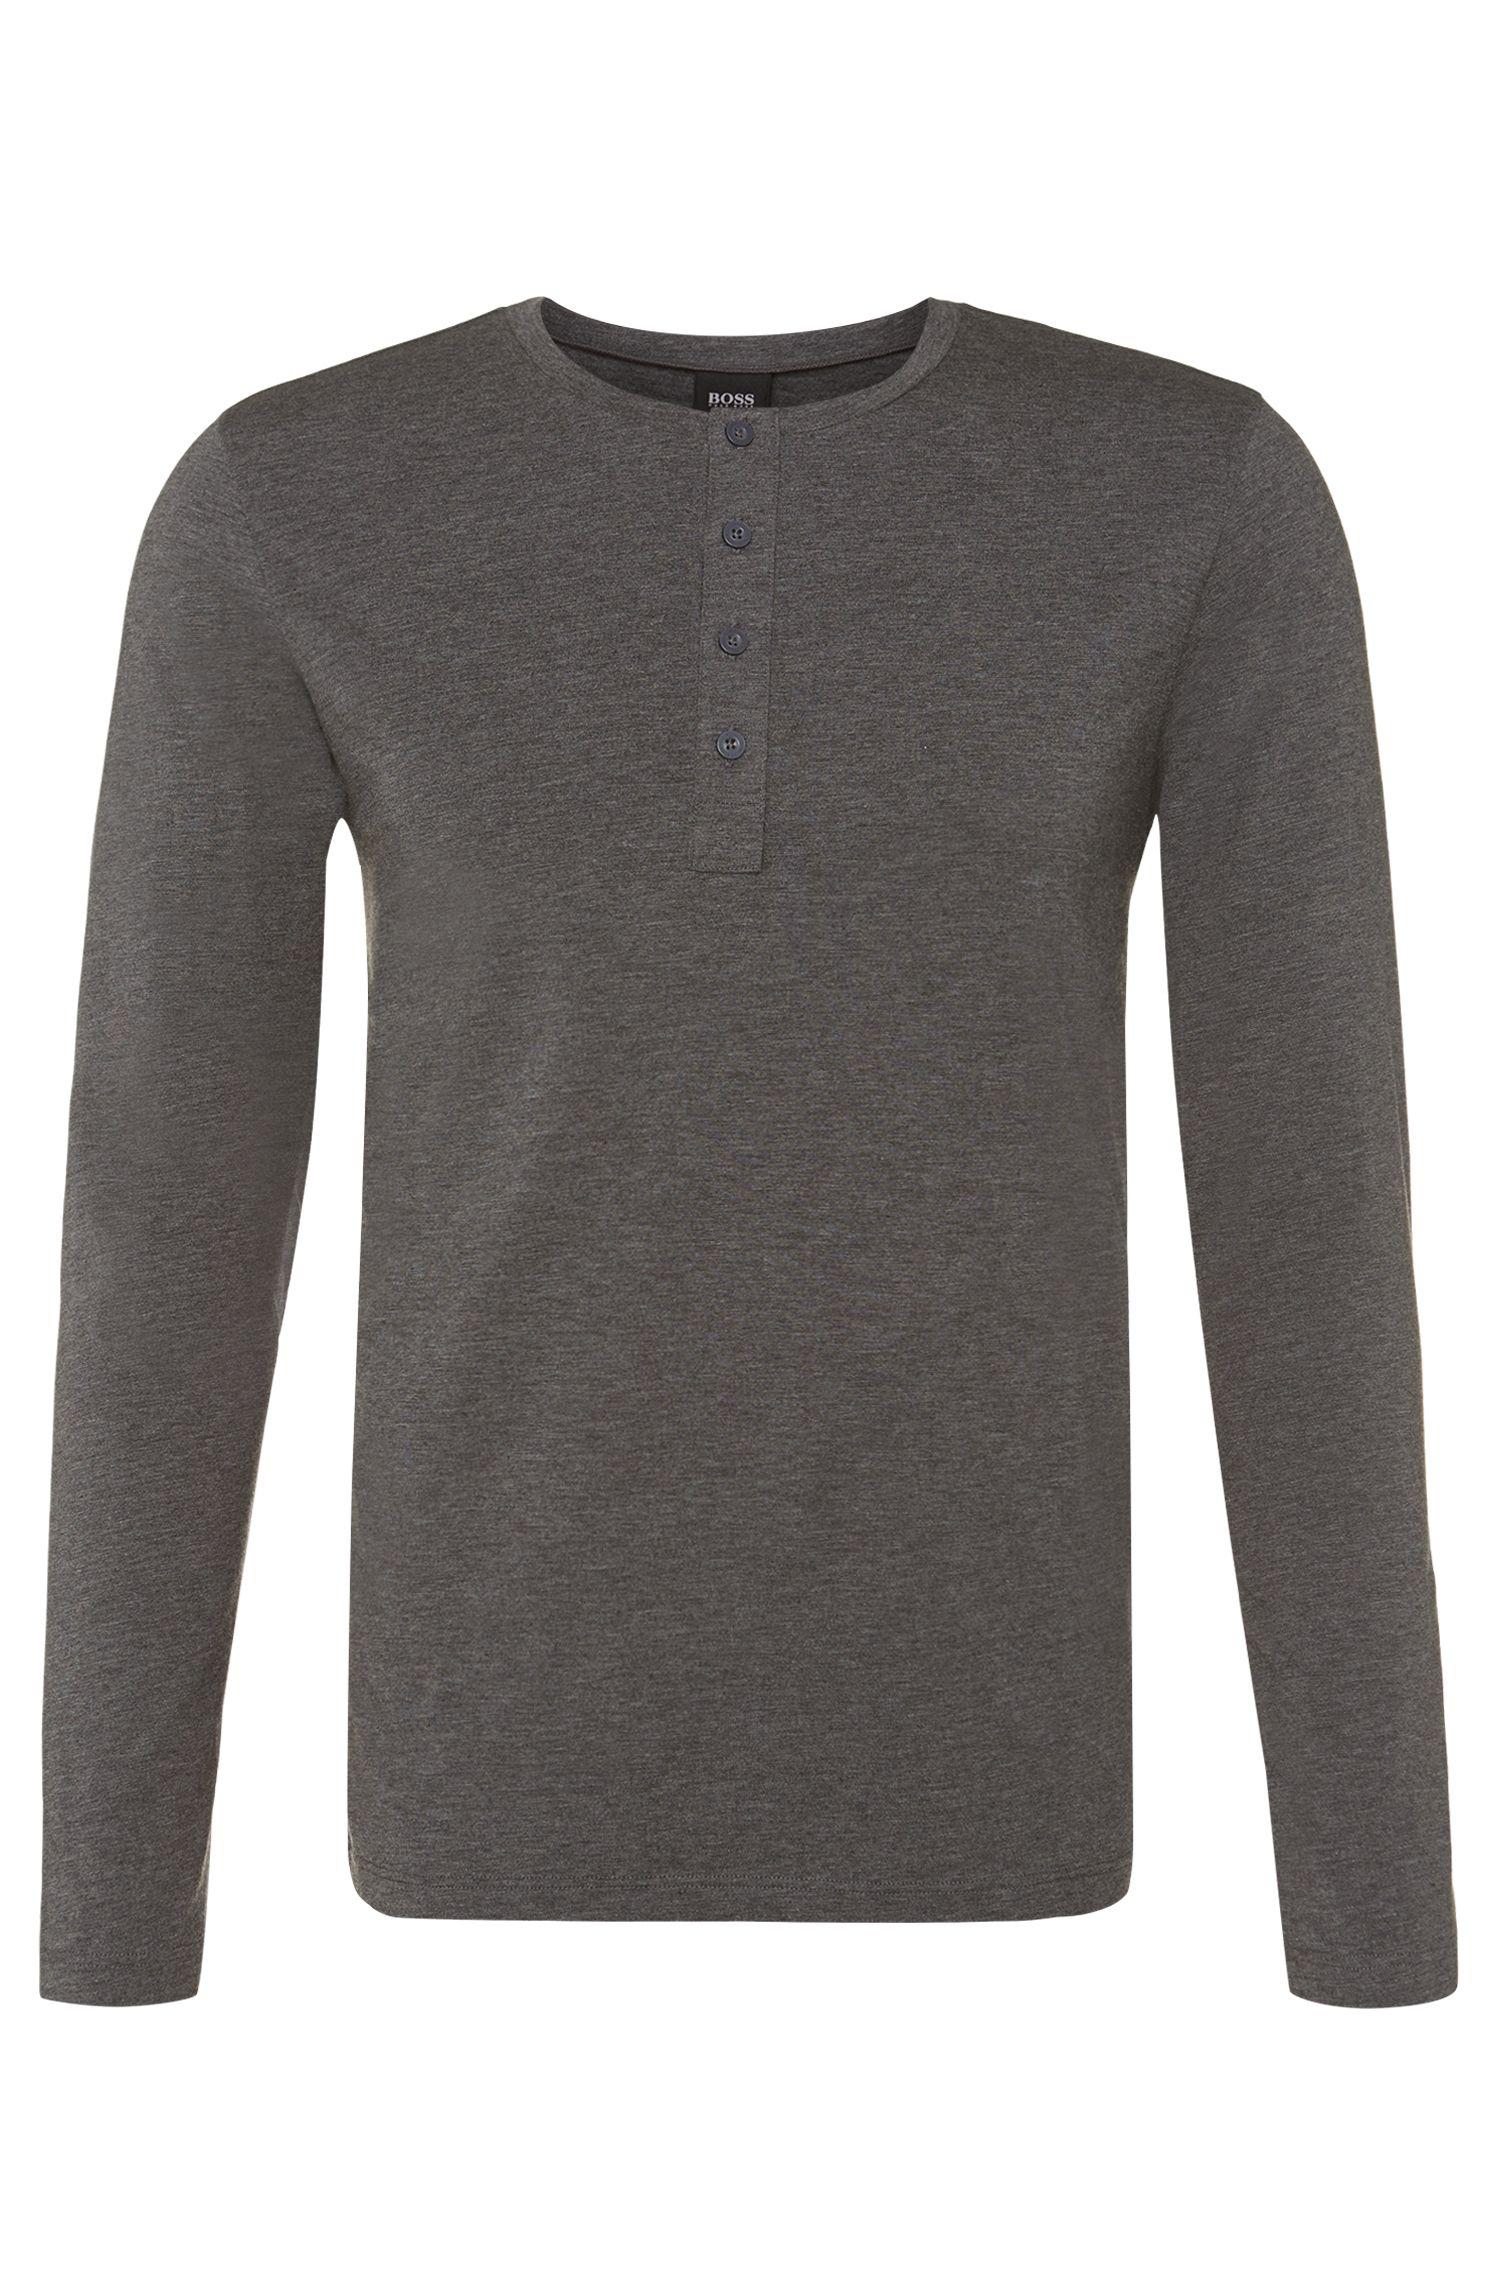 Camiseta de manga larga en mezcla de algodón: 'Shirt LSBP Balance'